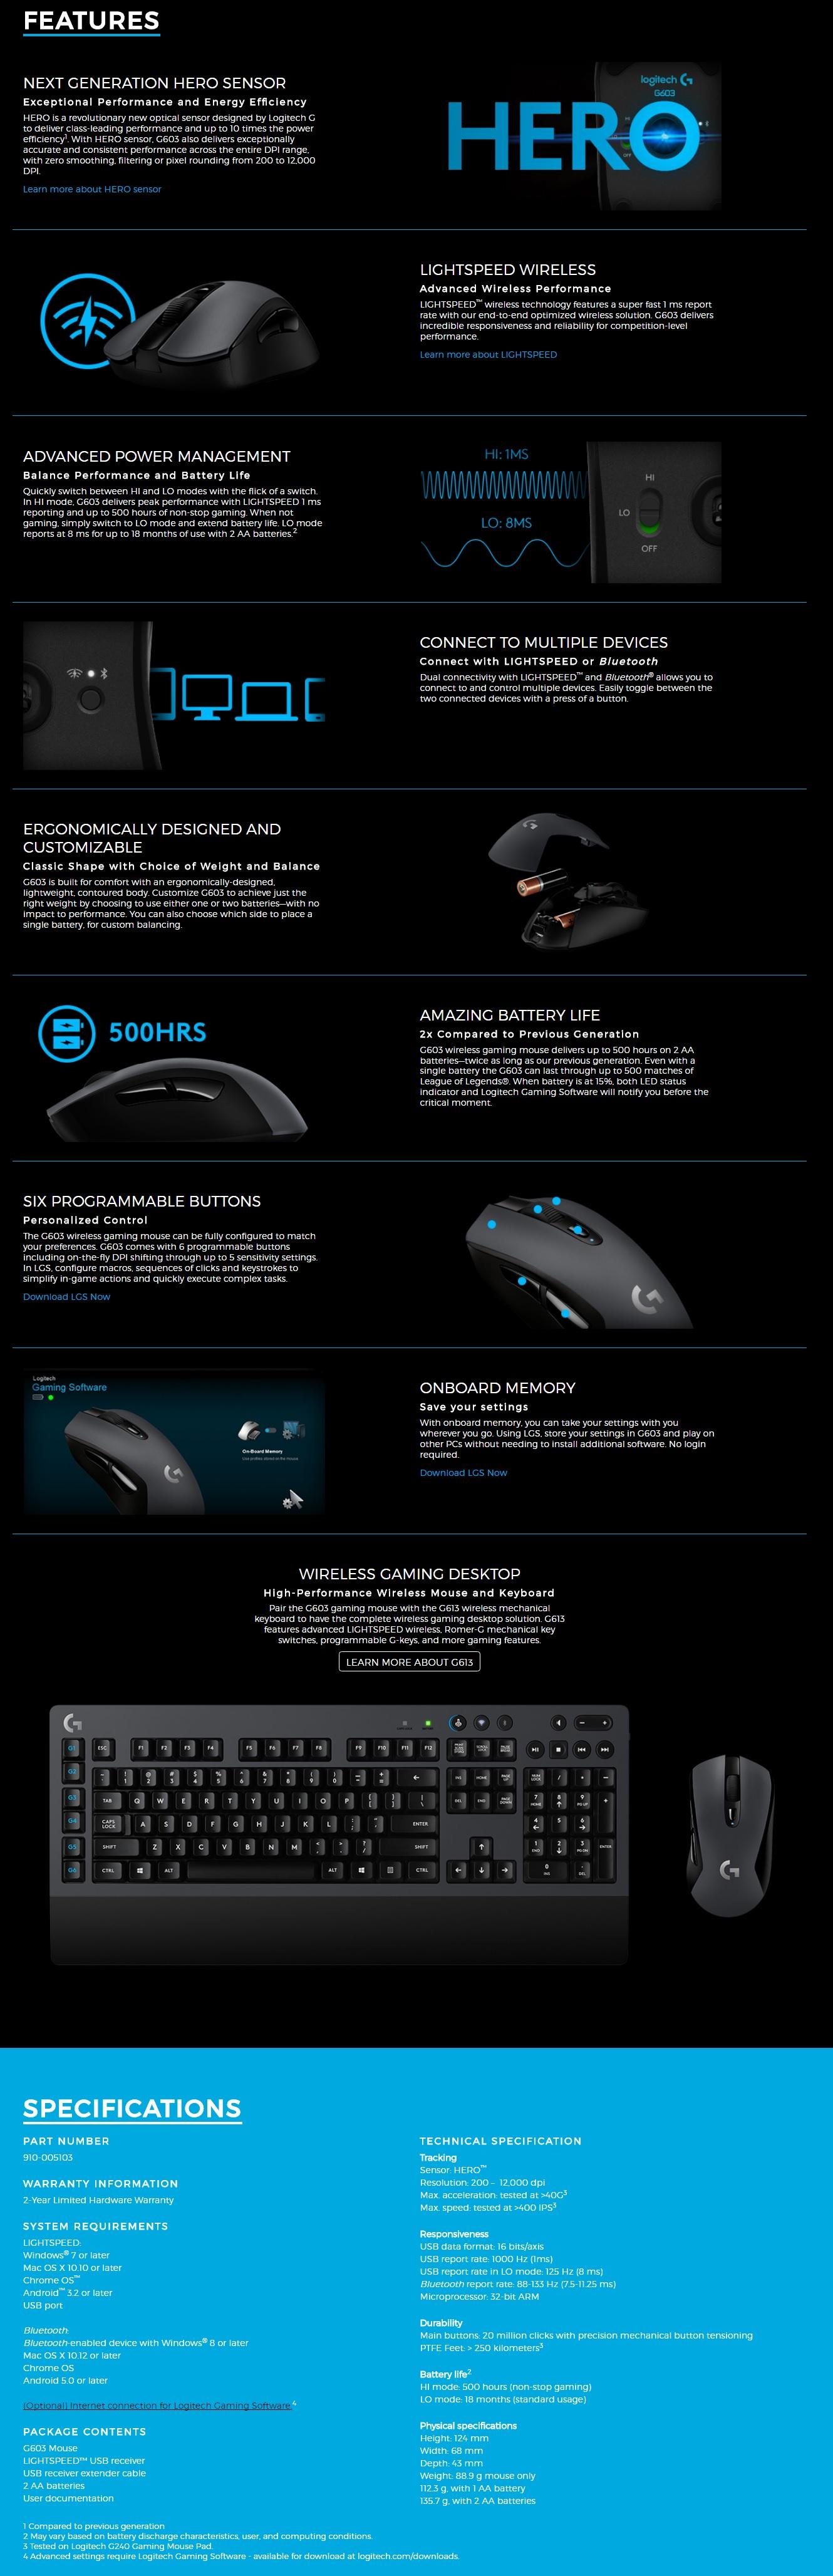 Logitech G603 LIGHTSPEED™ (910-005103) Wireless Gaming Mouse